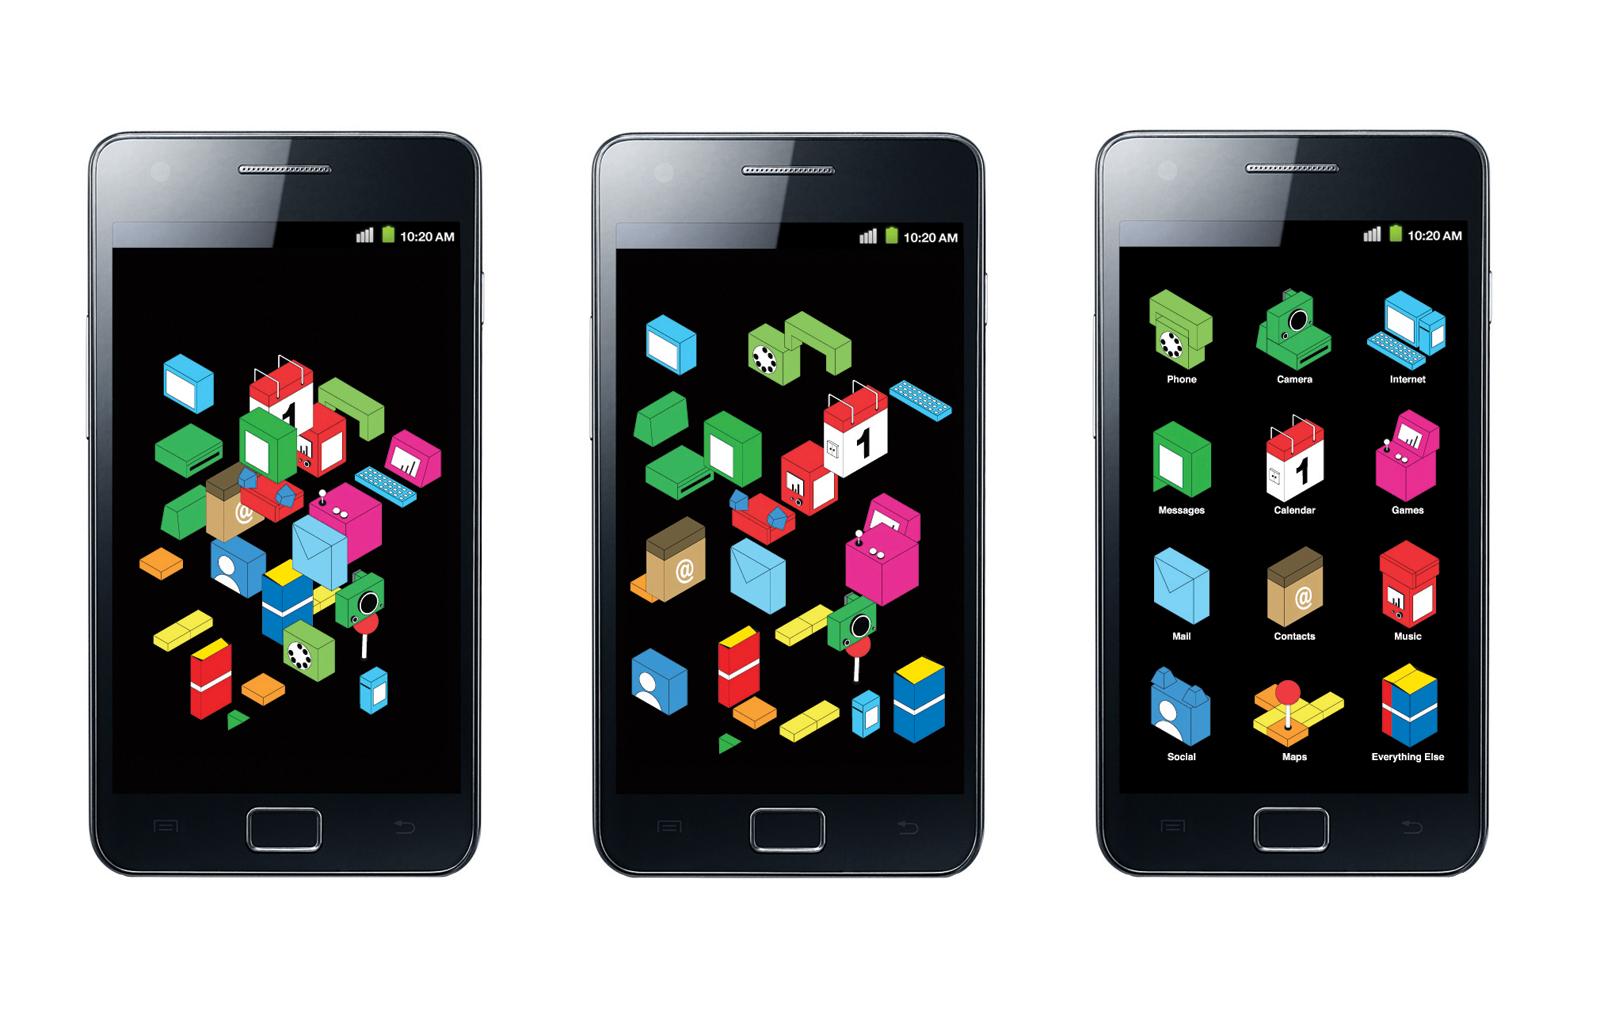 Android interface design by Natasha Jen